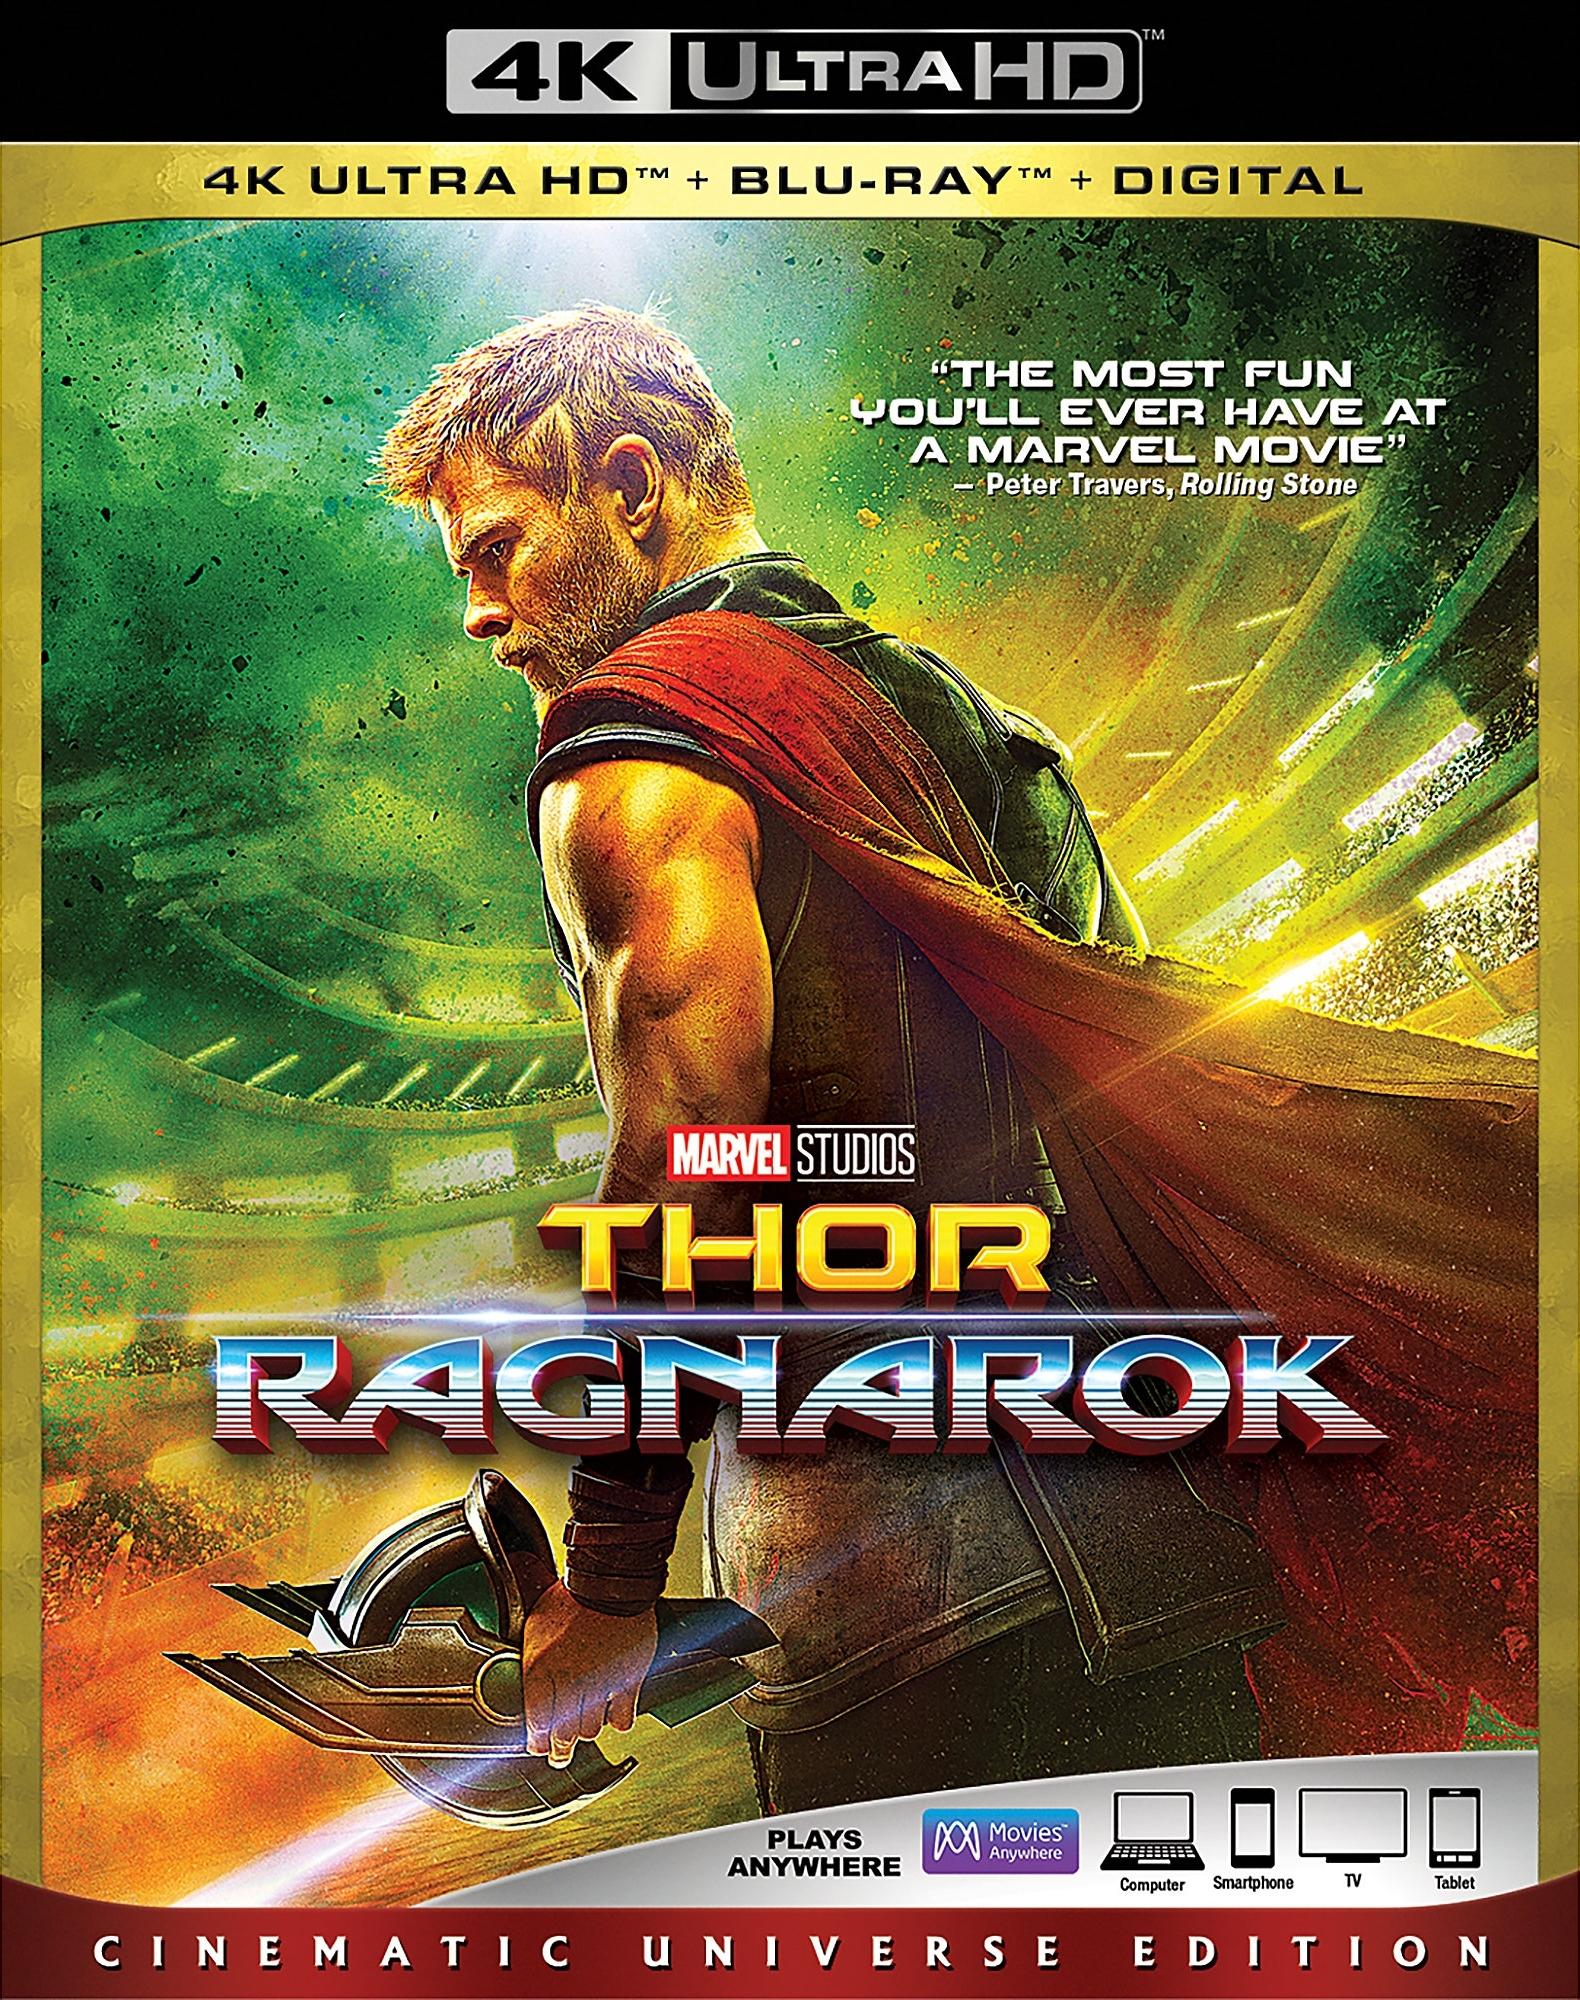 Thor: Ragnarok 4K (2017) 4K Ultra HD Blu-ray